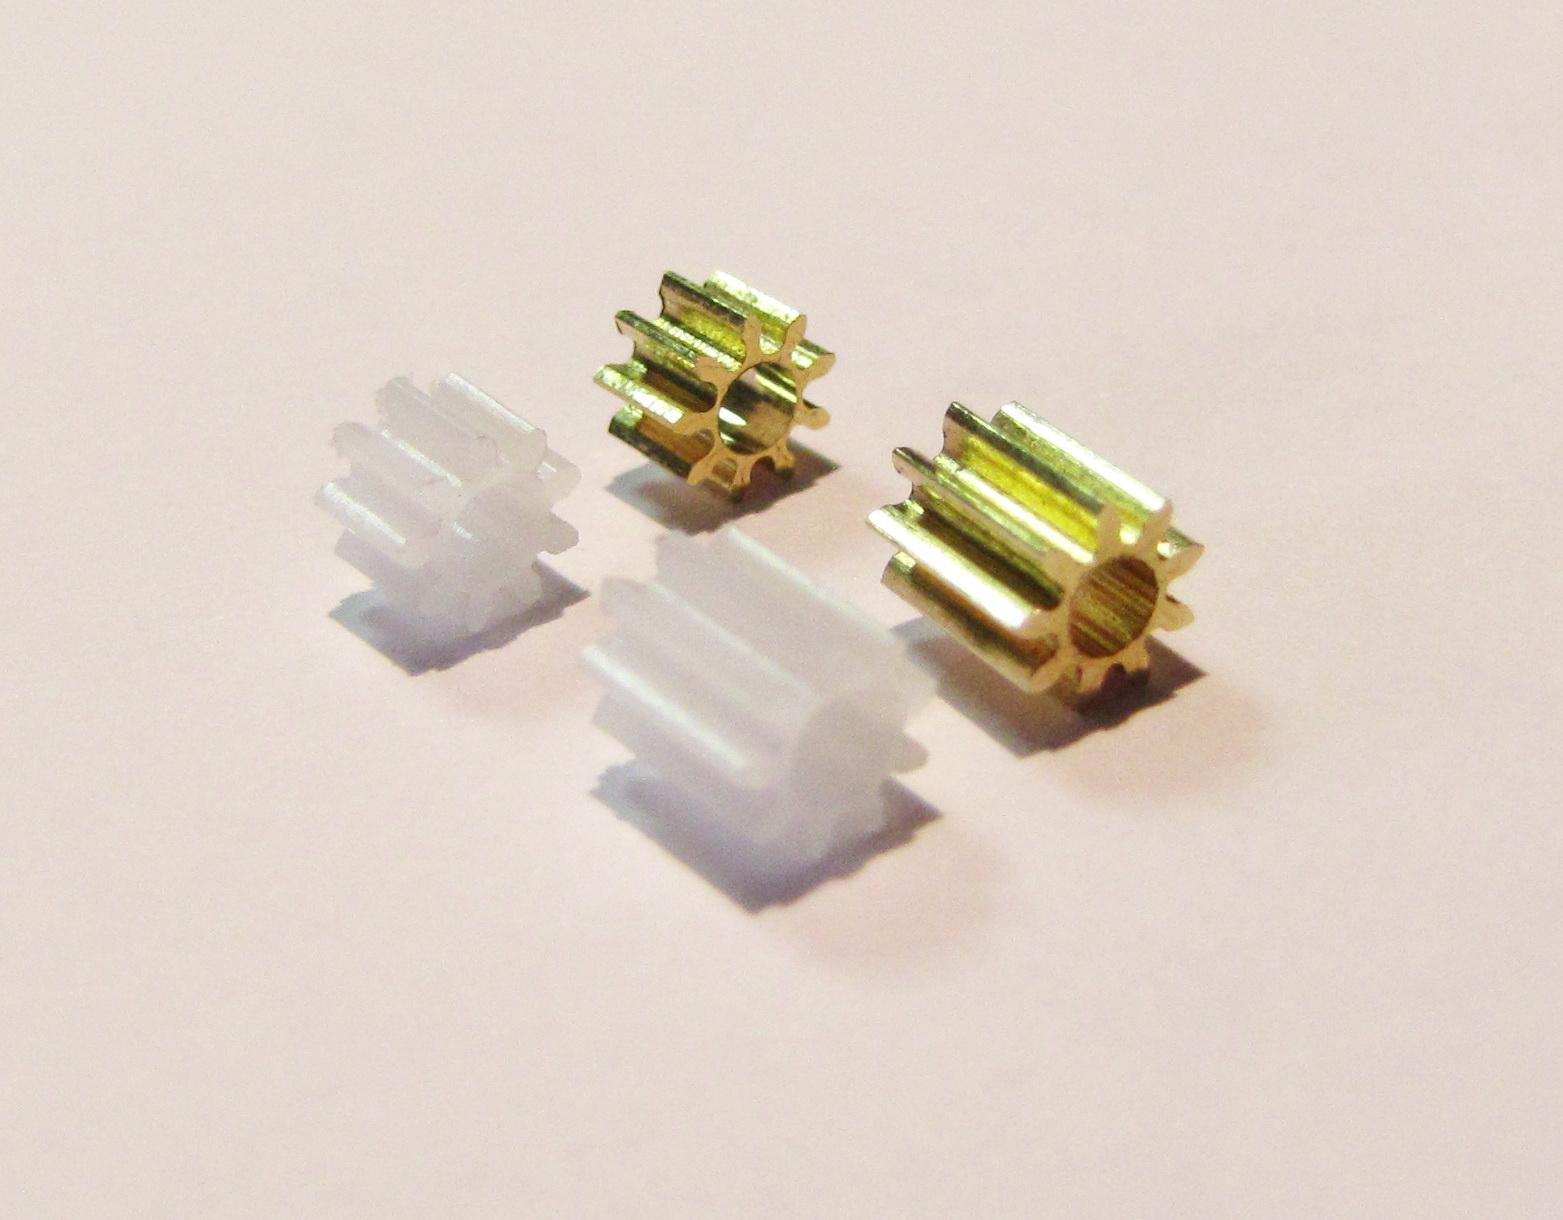 Zahnrad Ersatz Lego Duplo Lok 5 mm POM